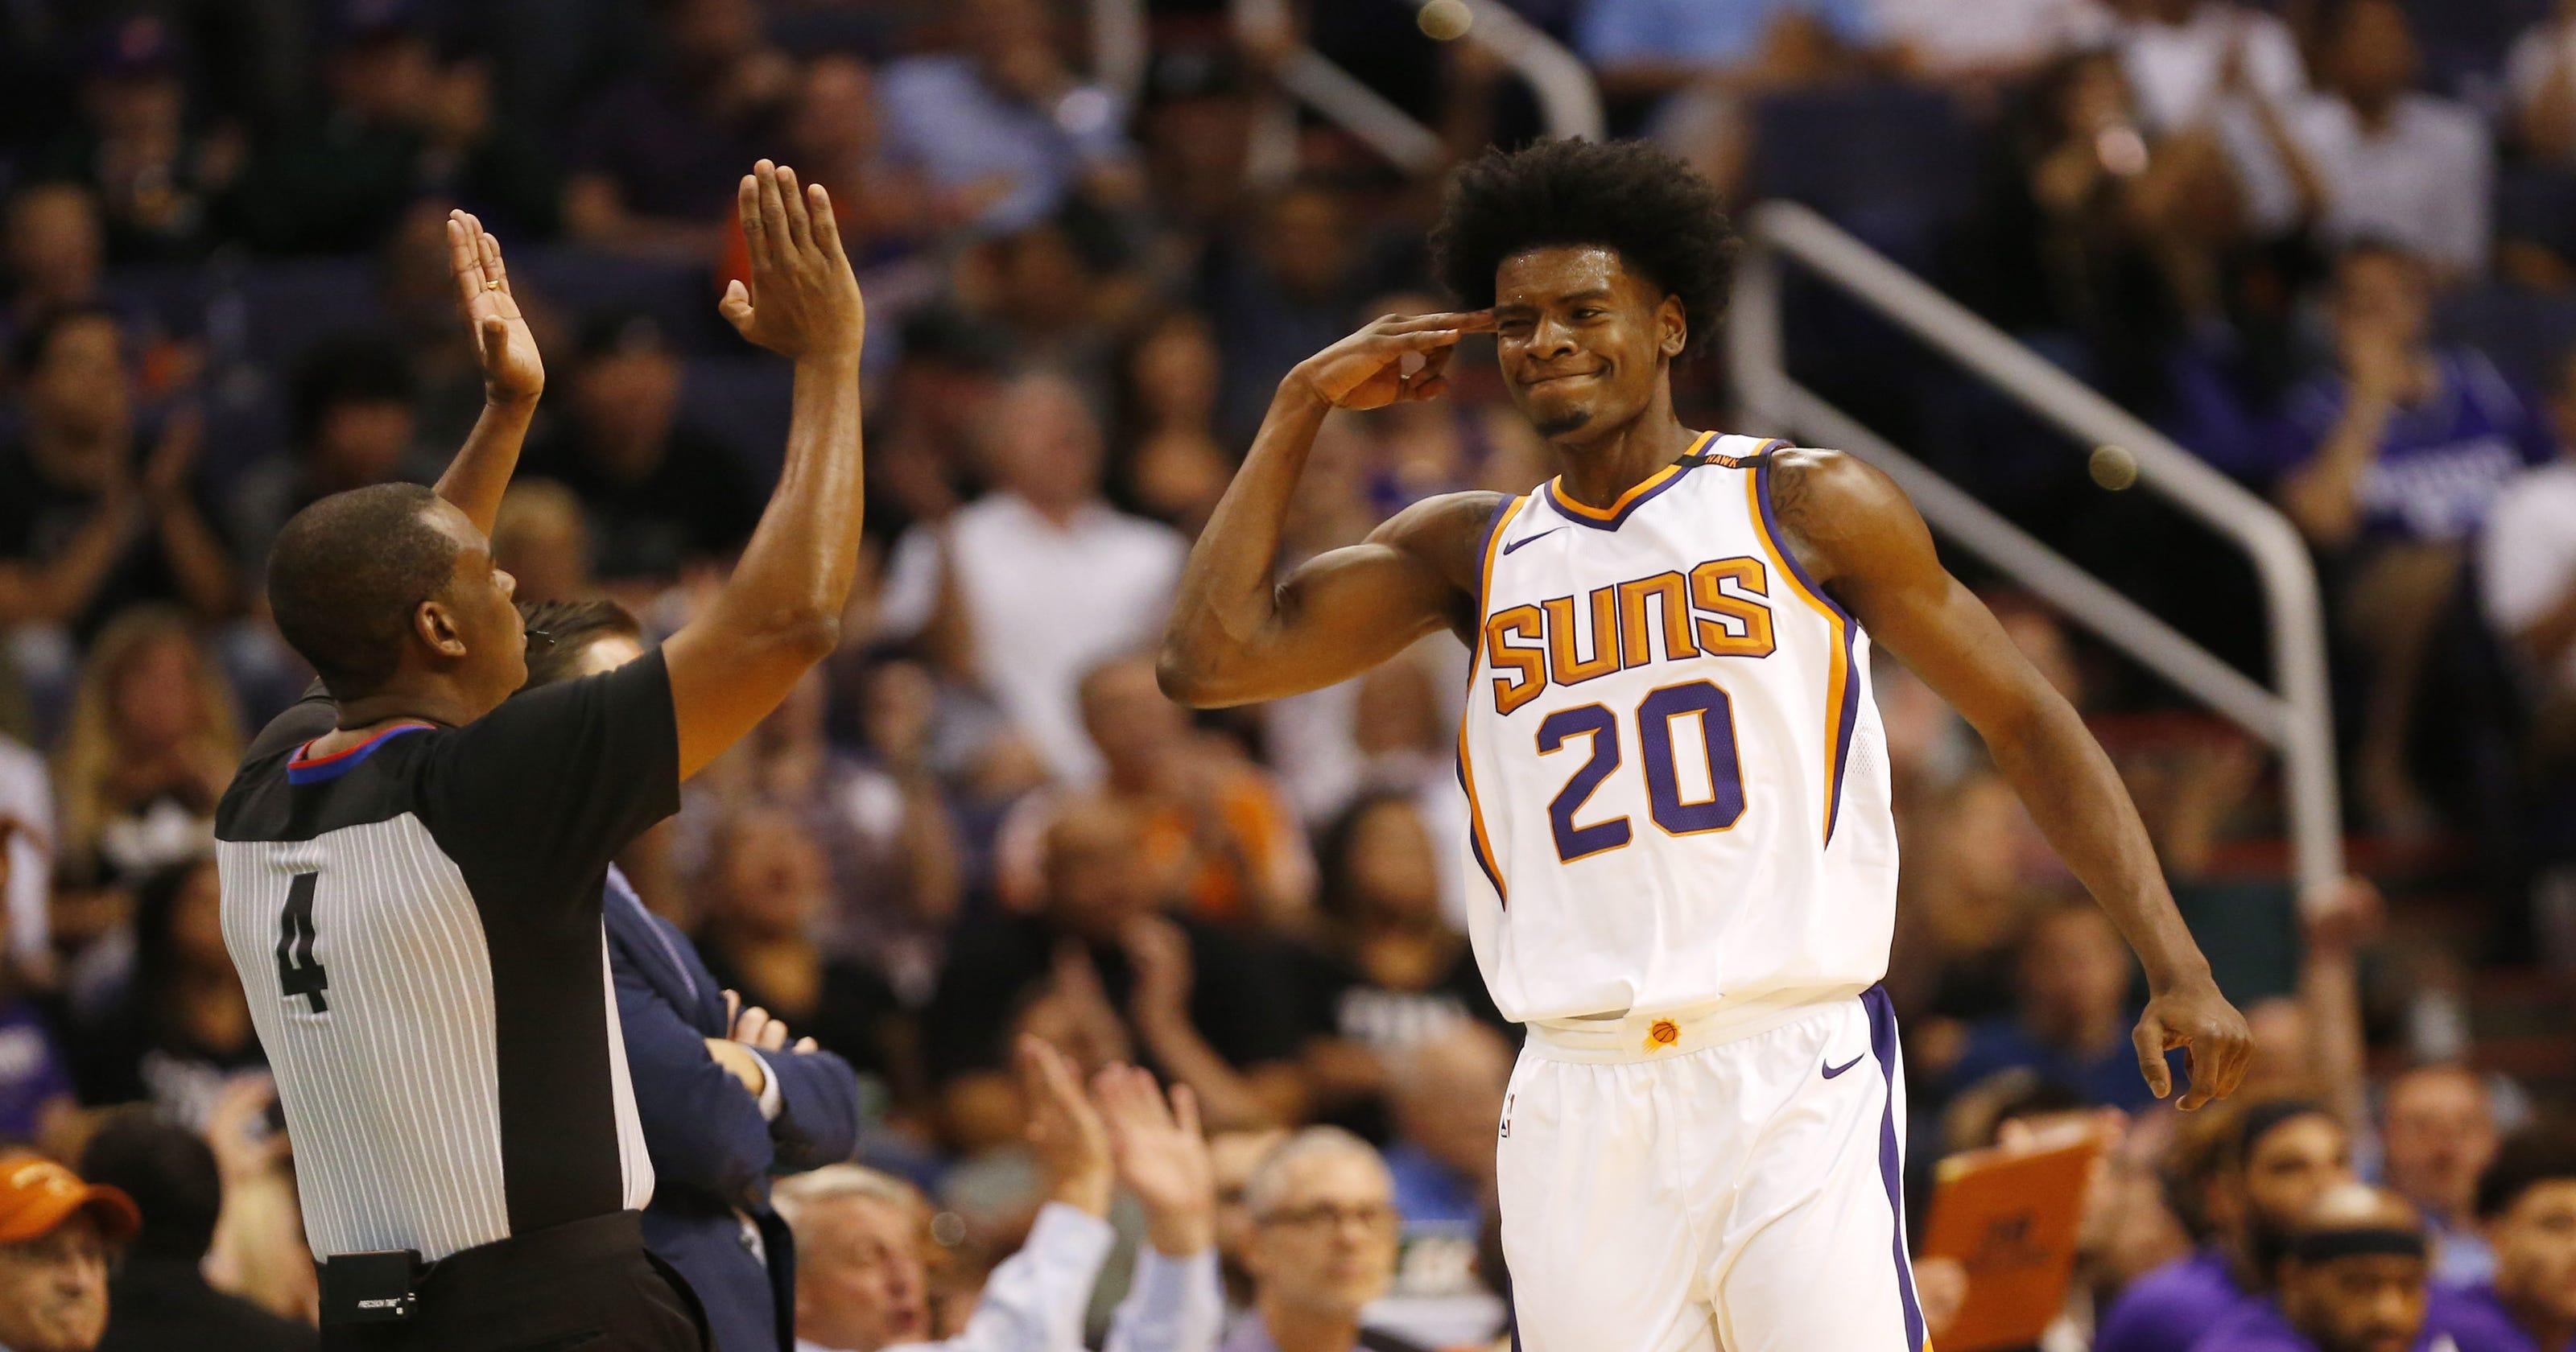 Suns News Josh Jacksons Hand Gesture Results In 35000 Fine